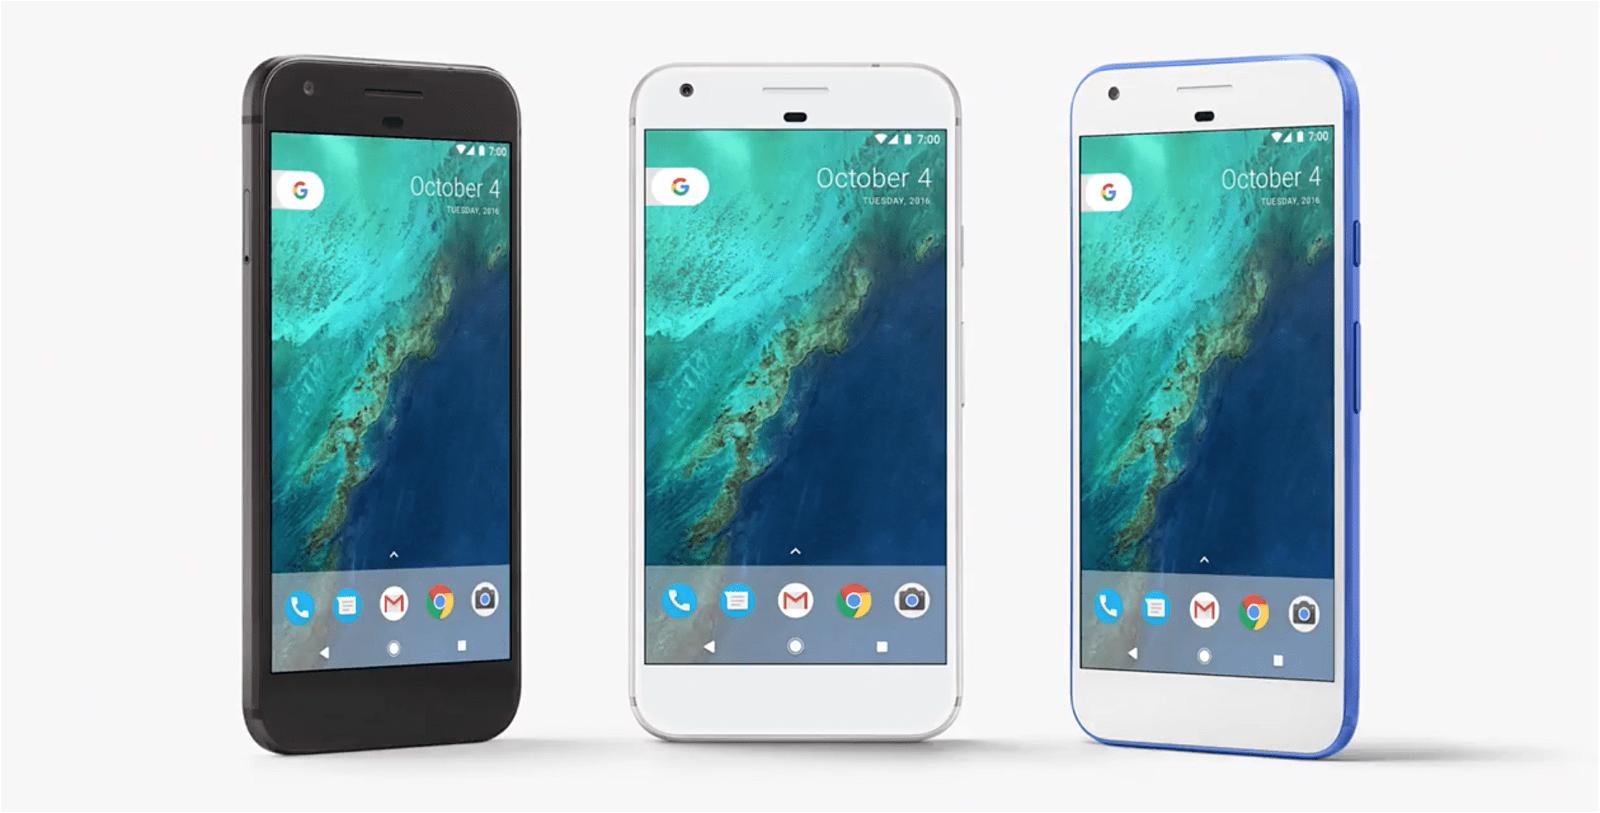 android 7.1 nougat, google pixel